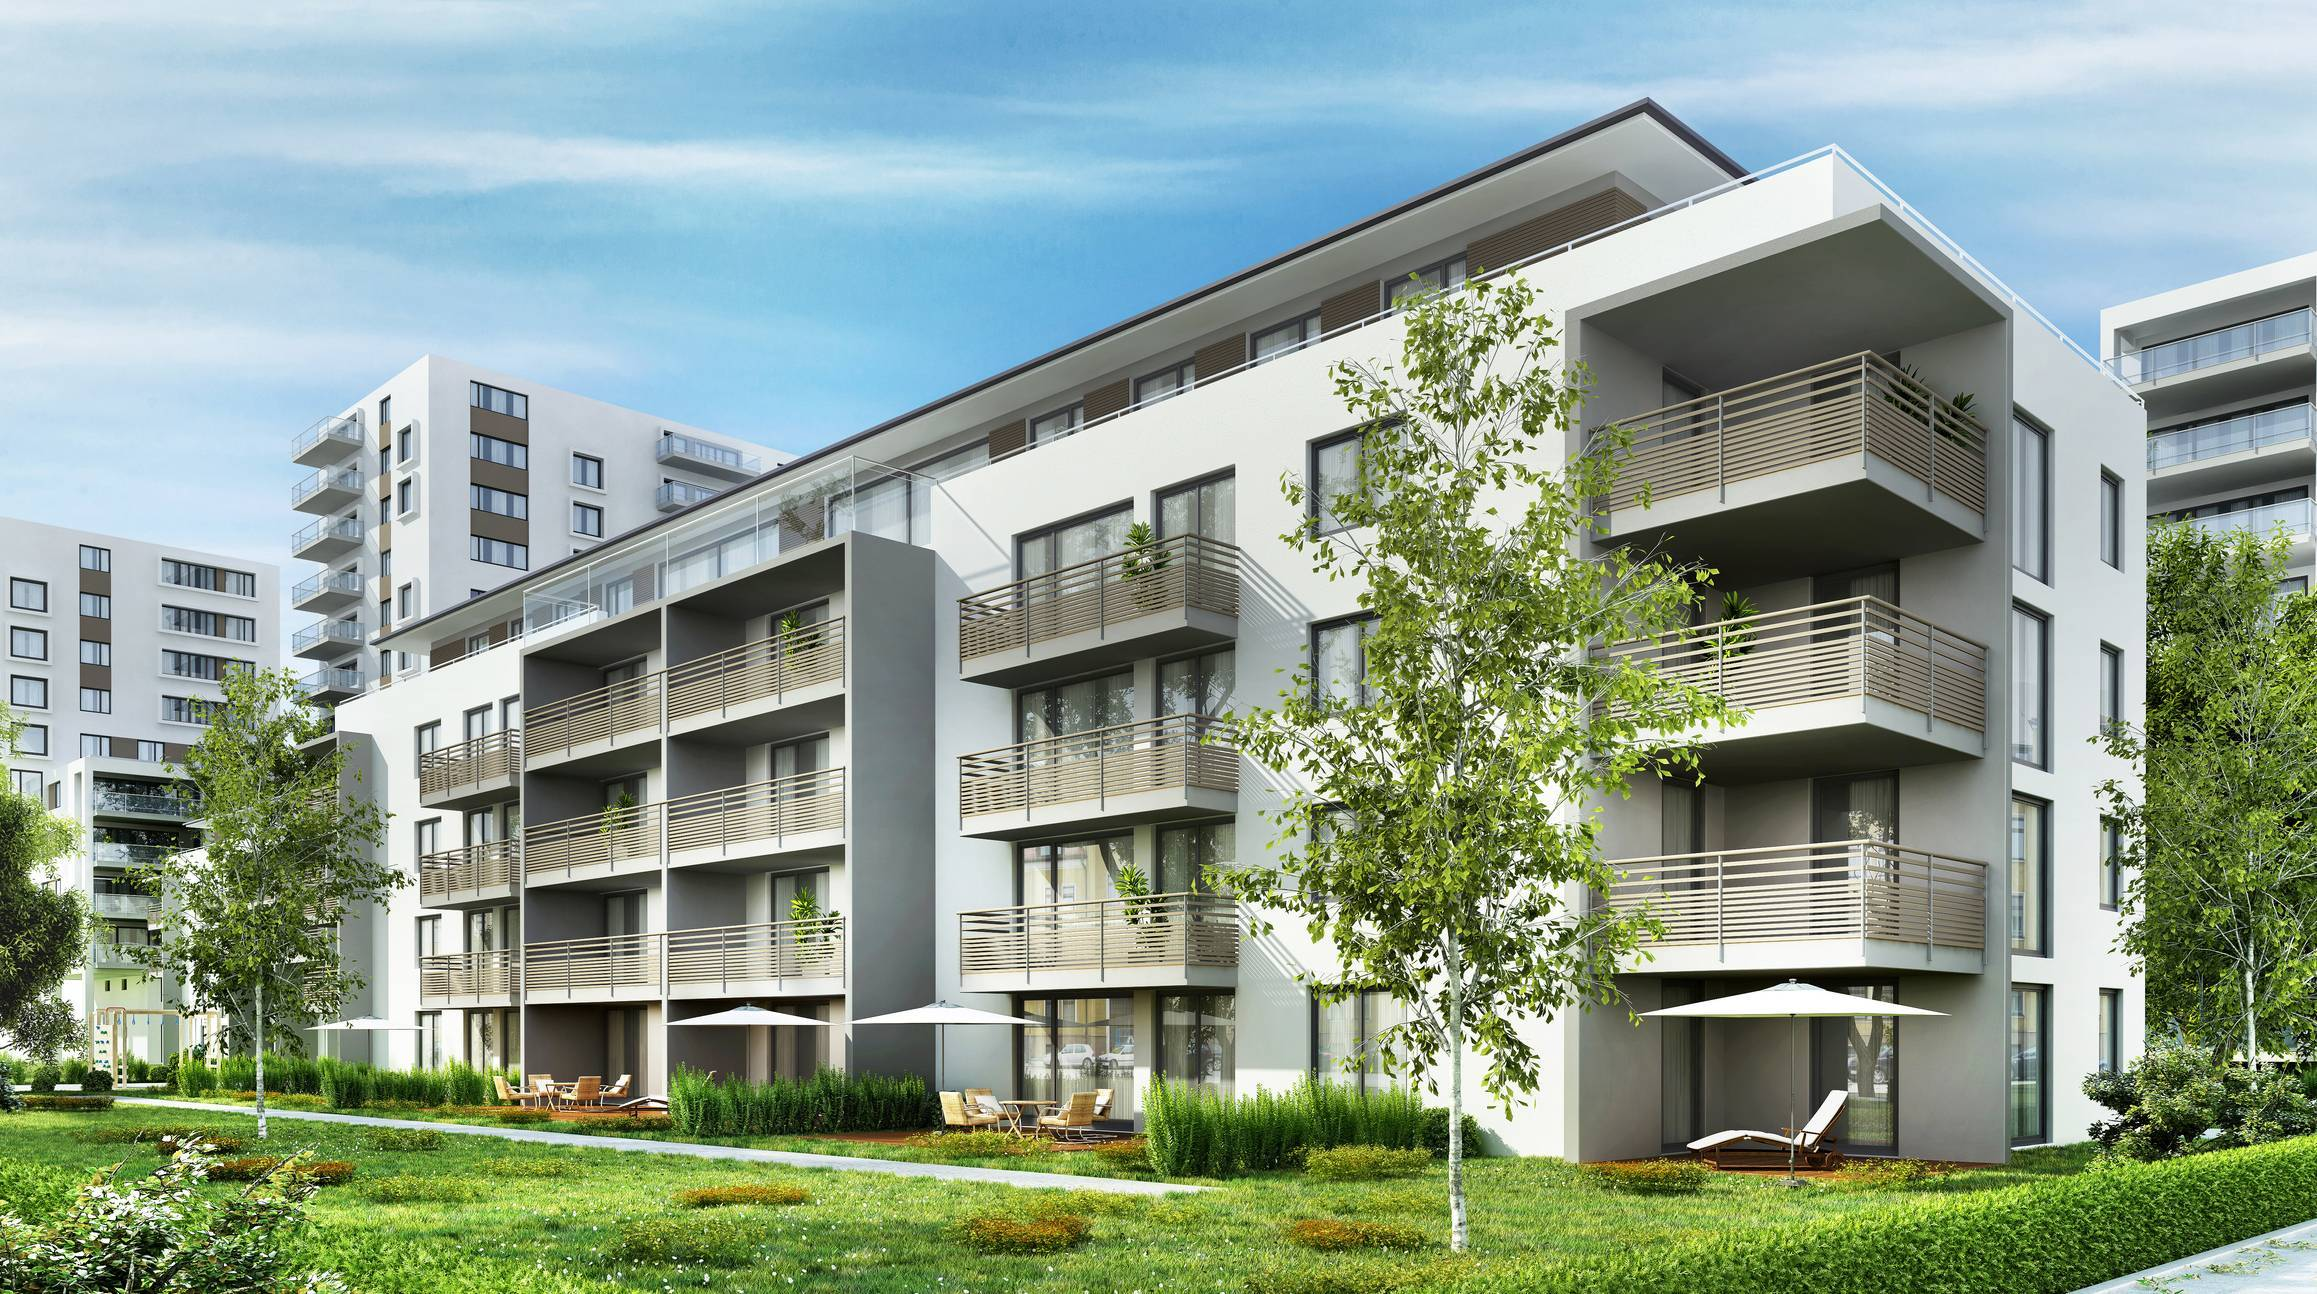 achat immobilier neuf programme investissement